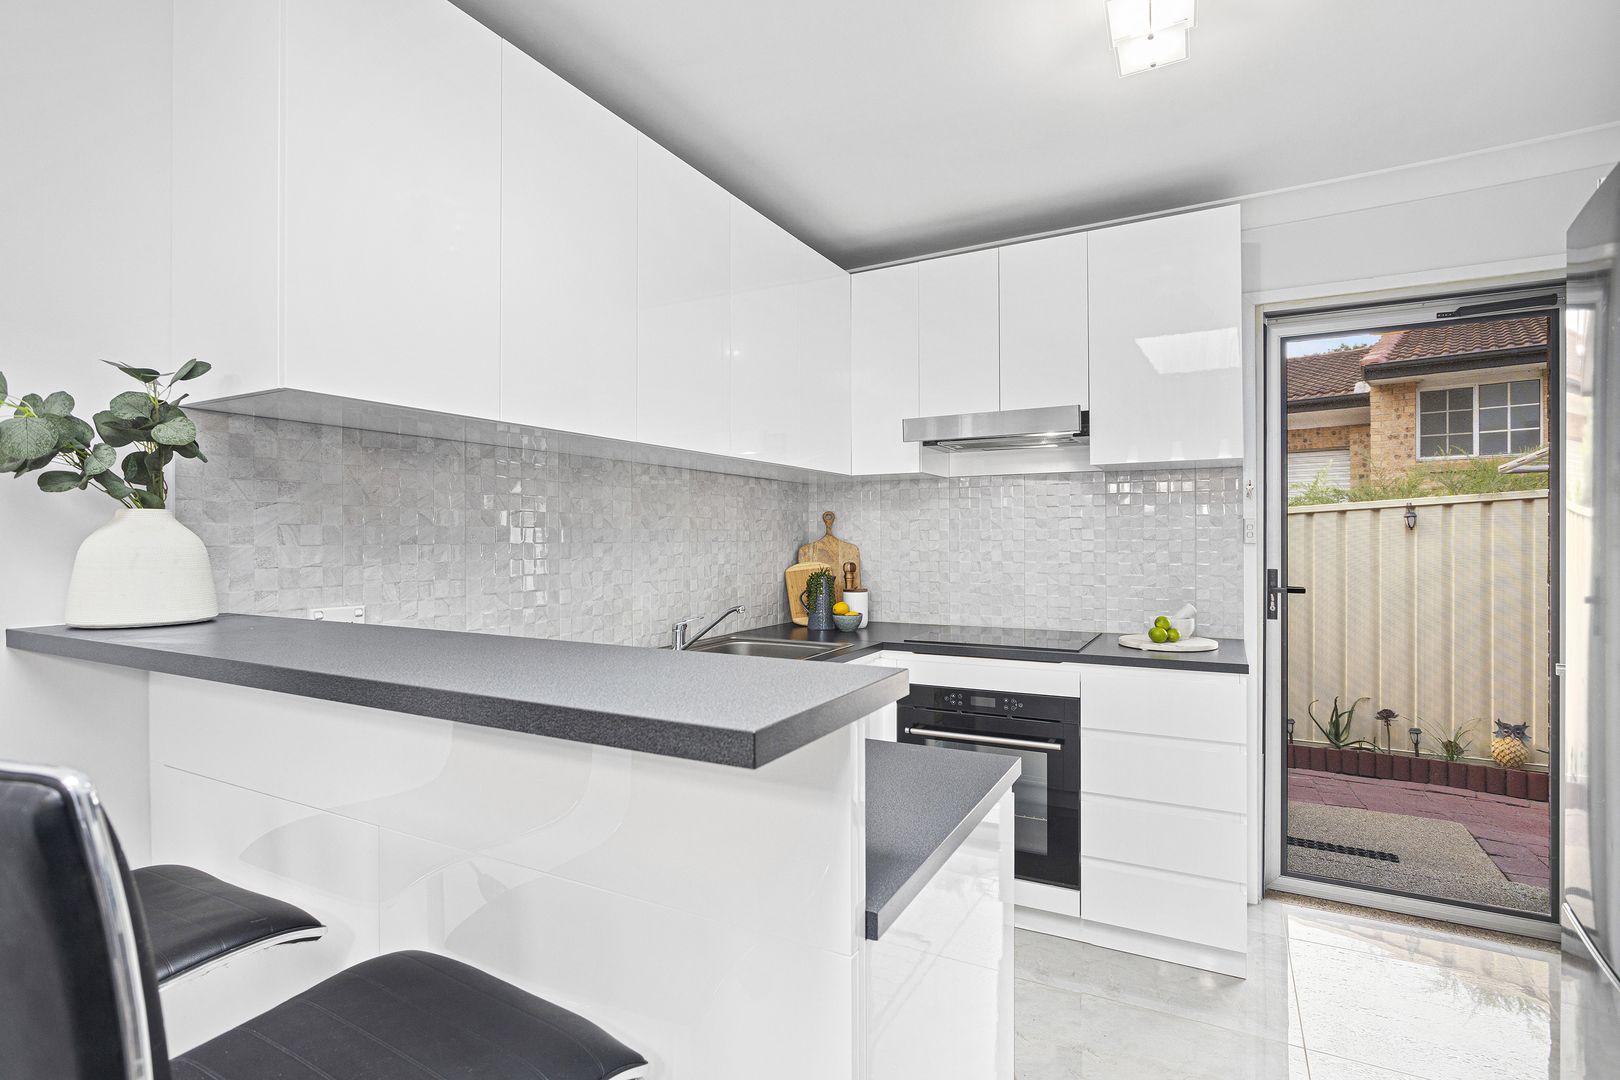 4/14 Strathearn Avenue, Wollongong NSW 2500, Image 1